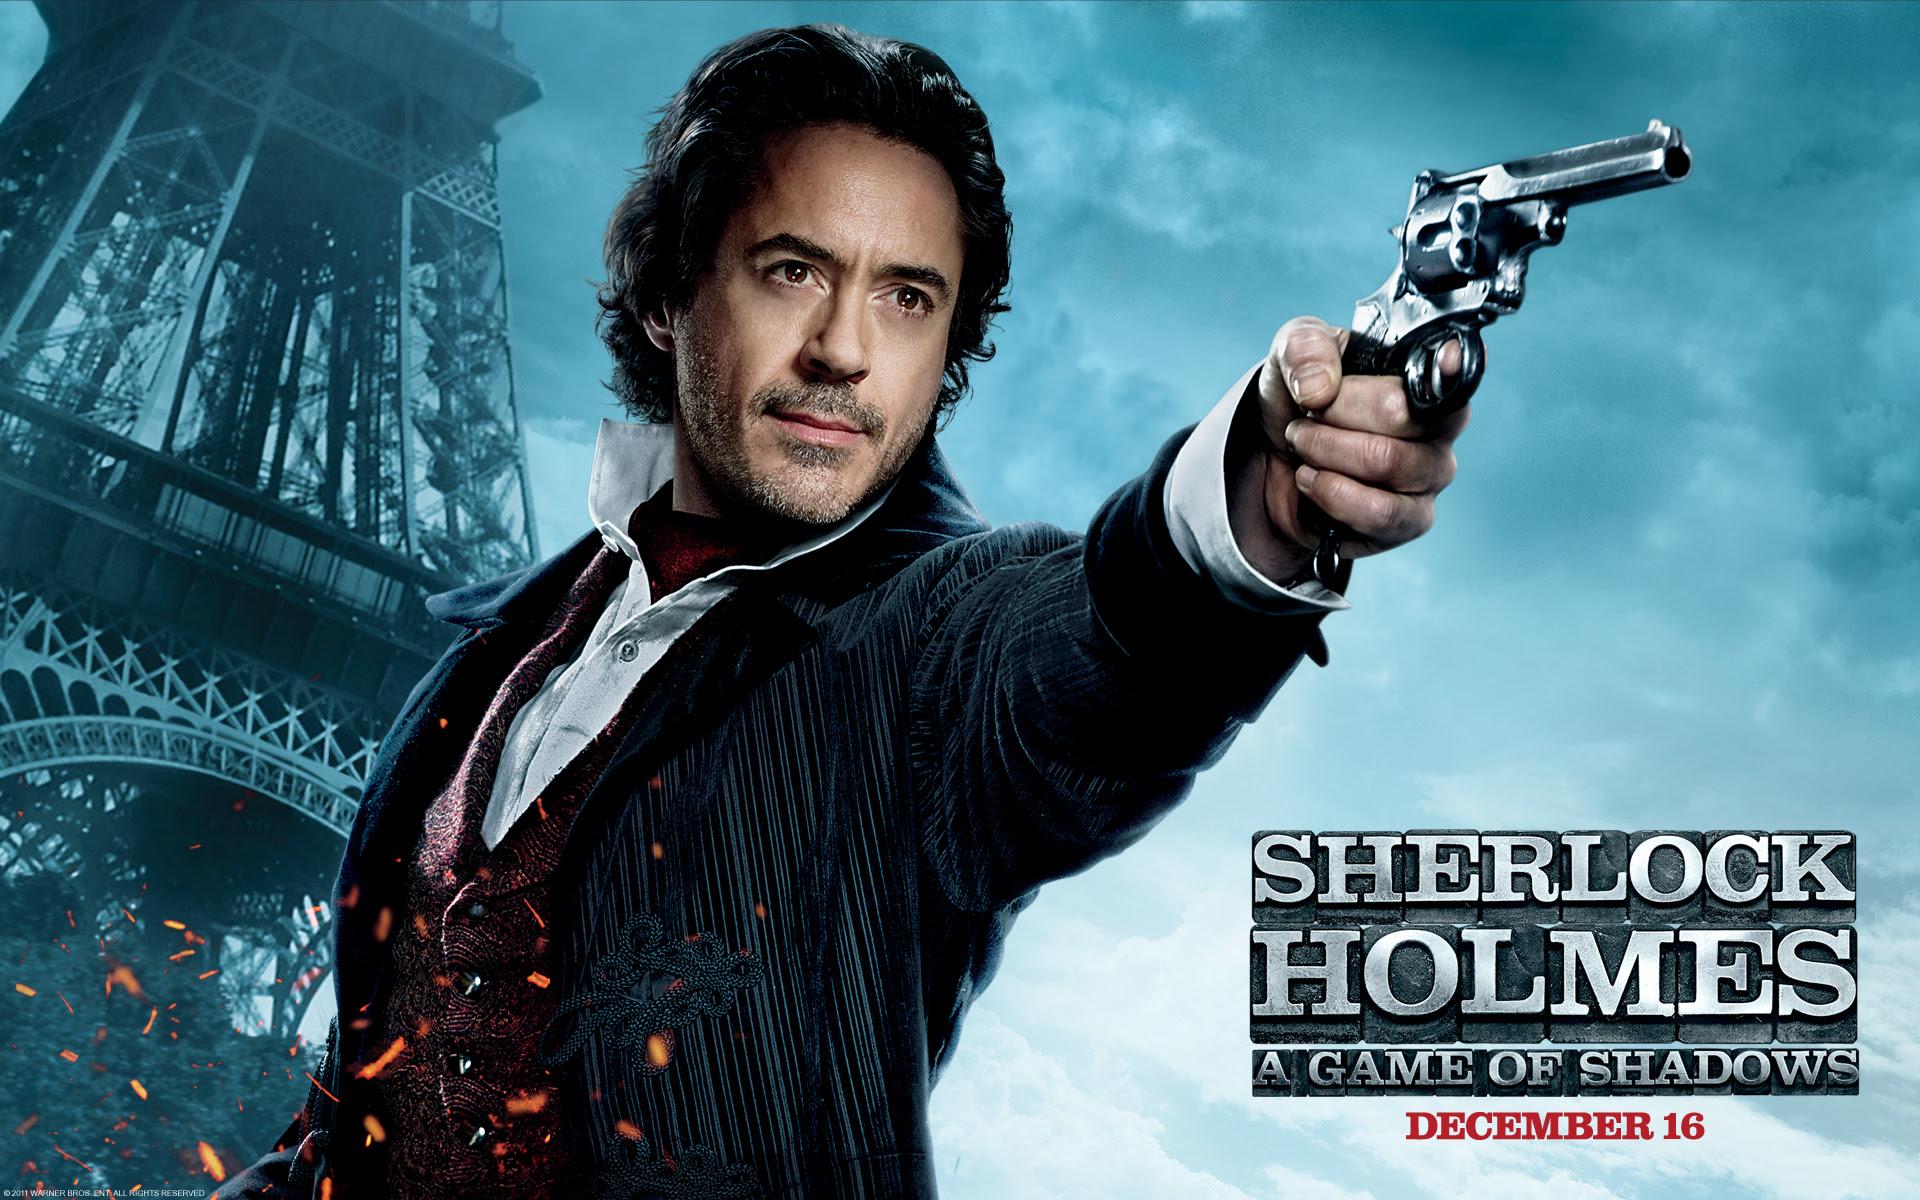 Wallpaper Destop Wallpaper Pc Wallpaper Ios Wallpaper Android Robert Downey Jr In Sherlock Holmes 2 Wallpaper Movies